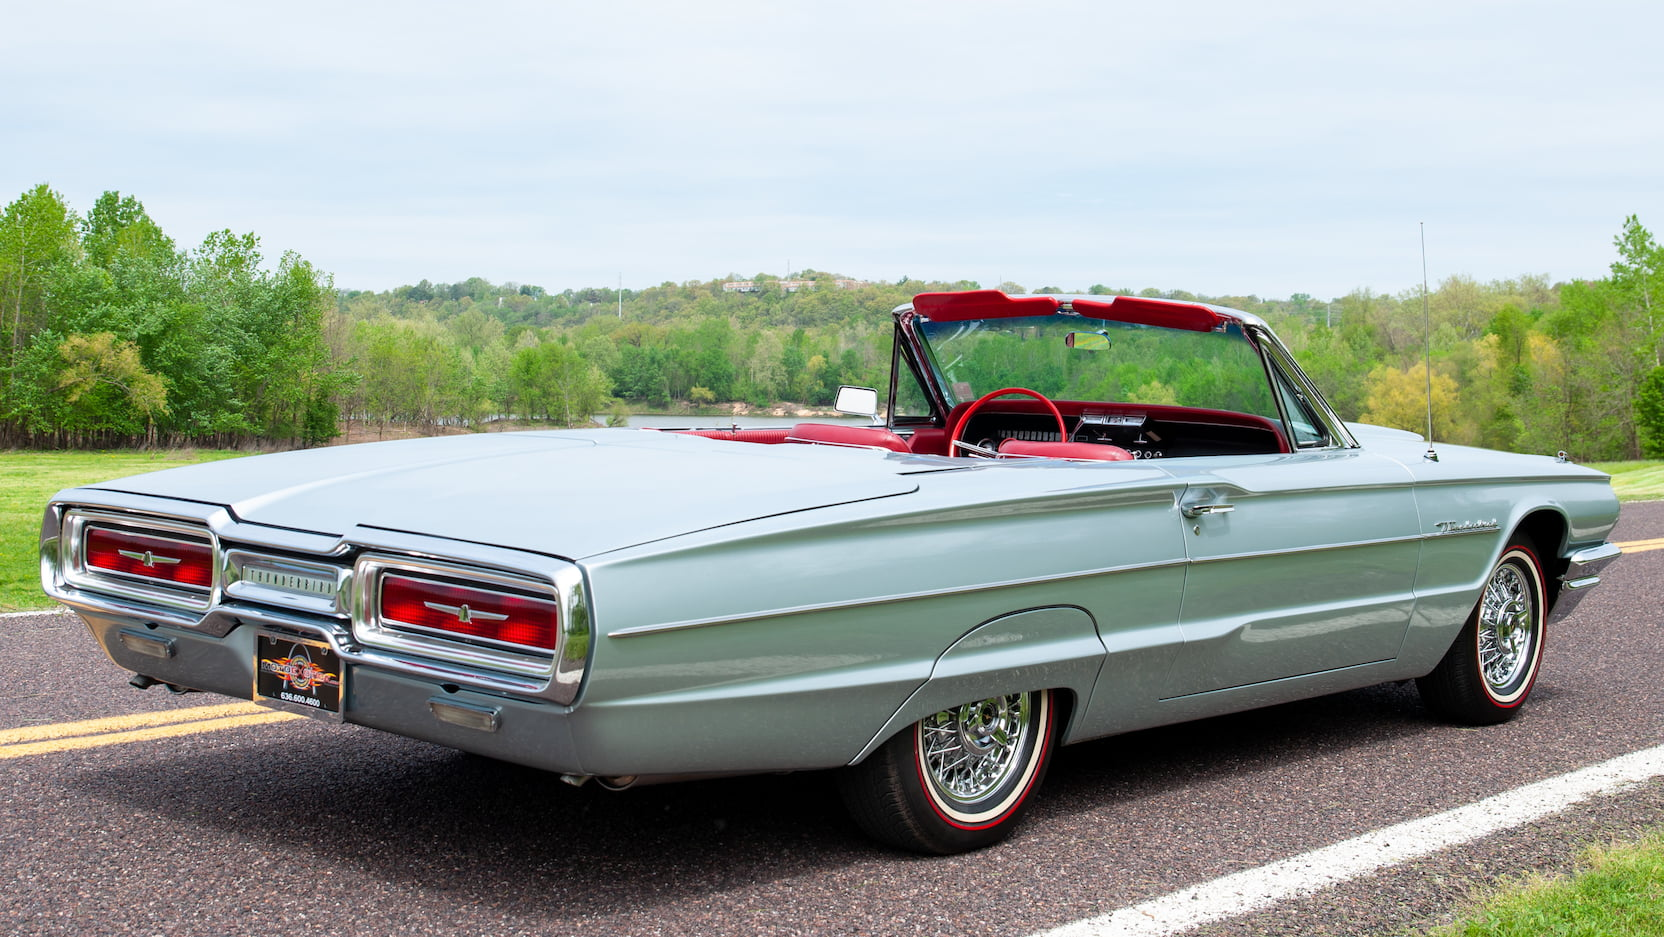 1964 Ford Thunderbird rear 3/4